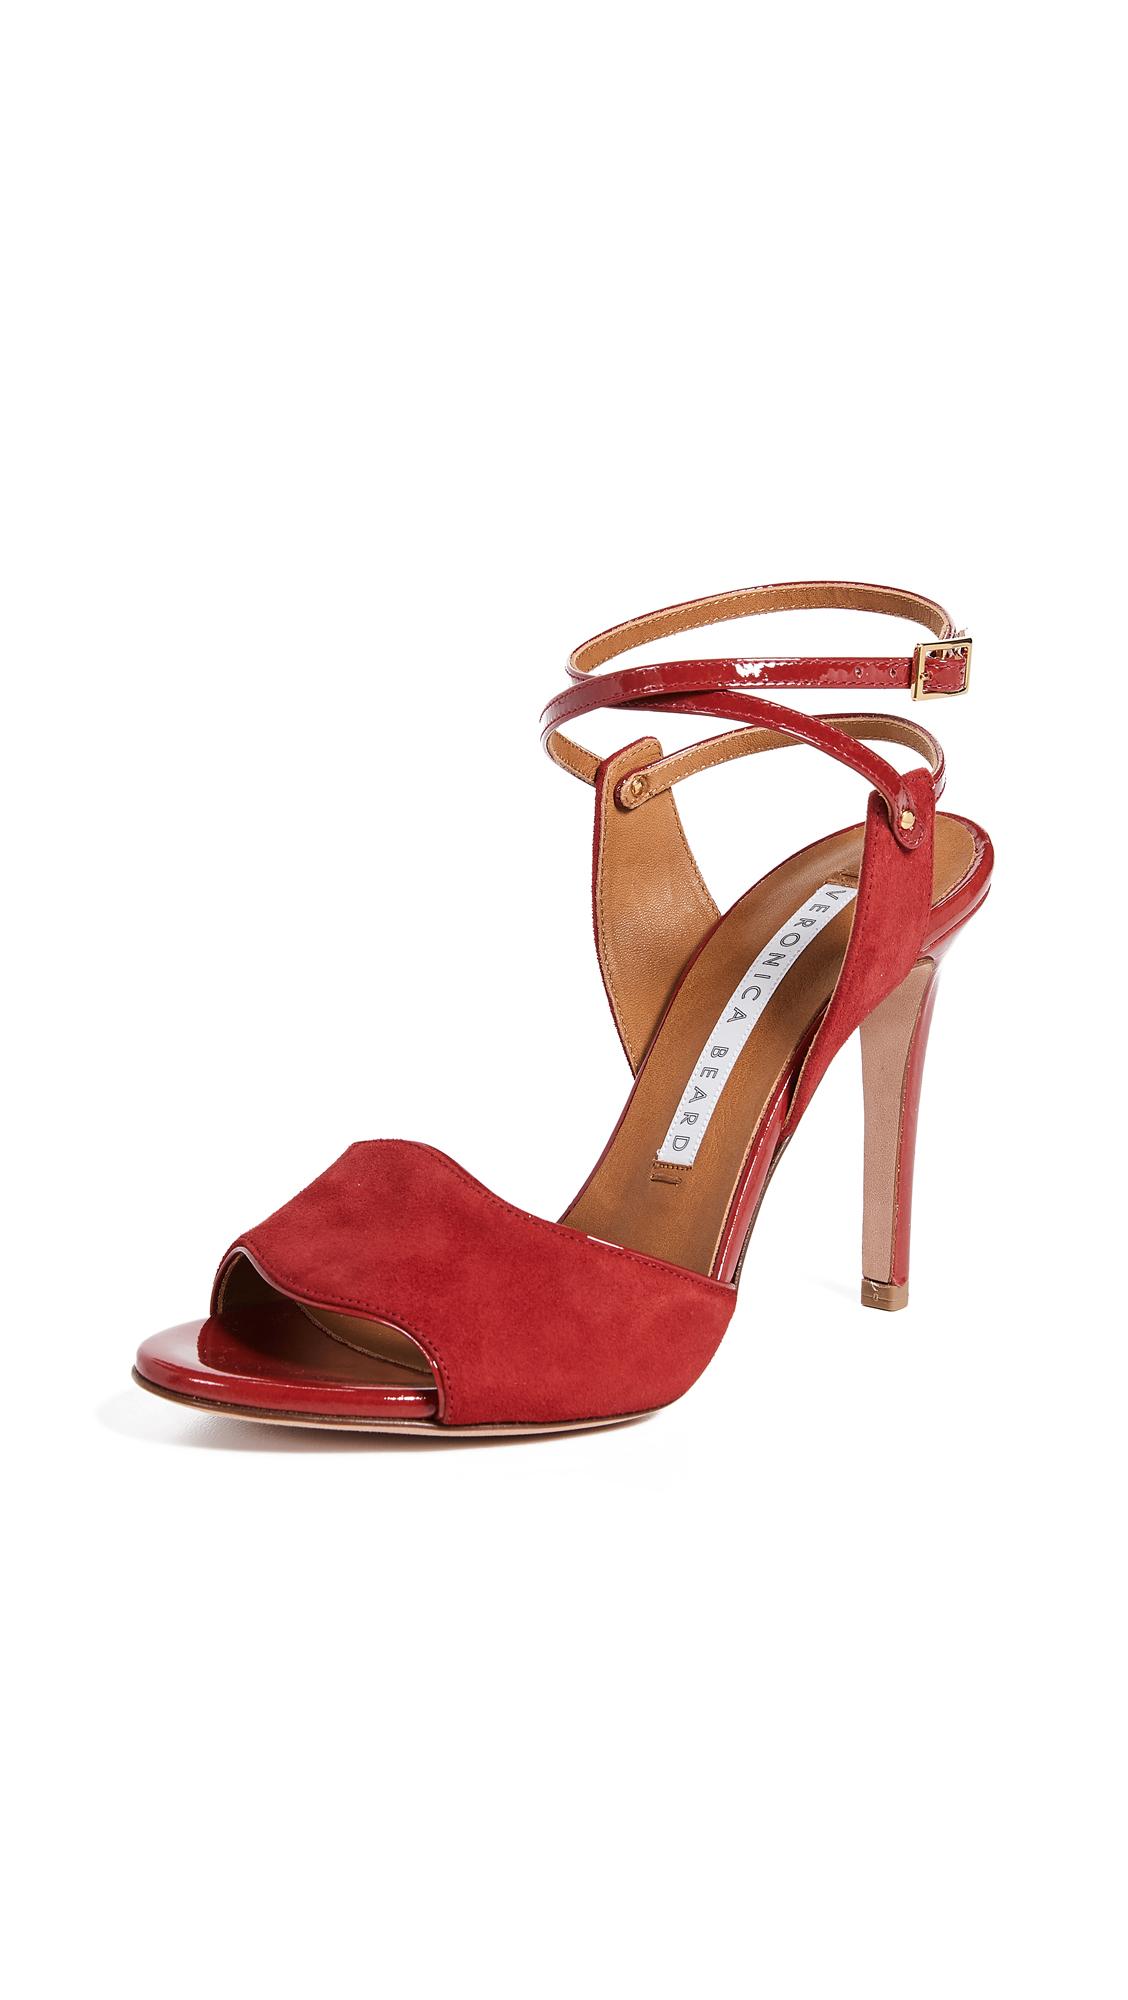 Veronica Beard Suma Strappy Sandal Pumps - Cherry